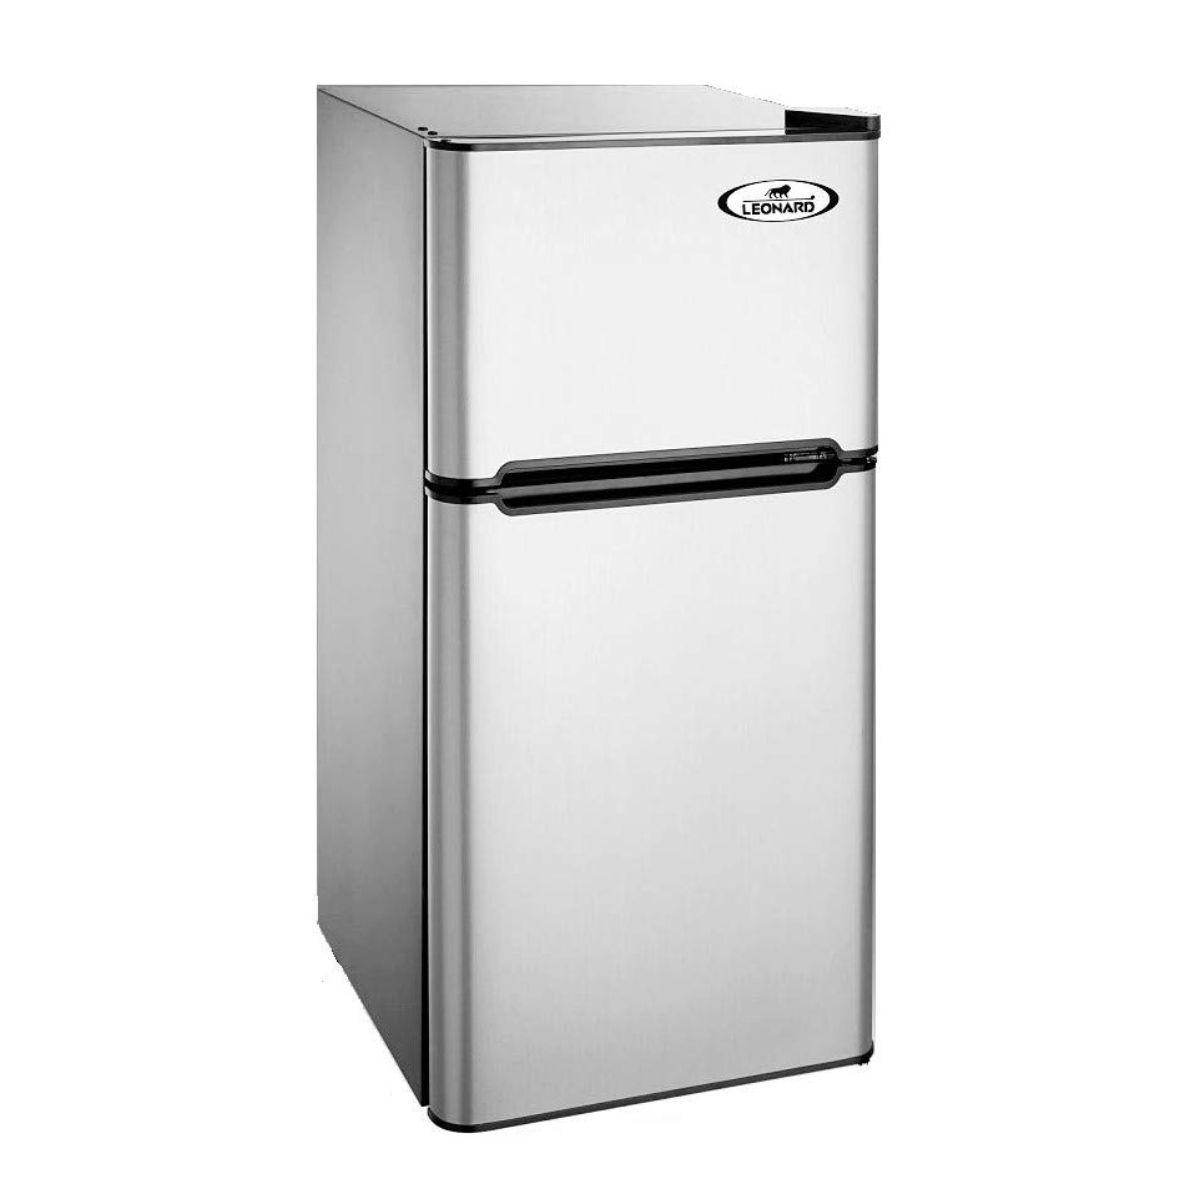 Leonard USA 110 Liters Double Door Mini Refrigerator